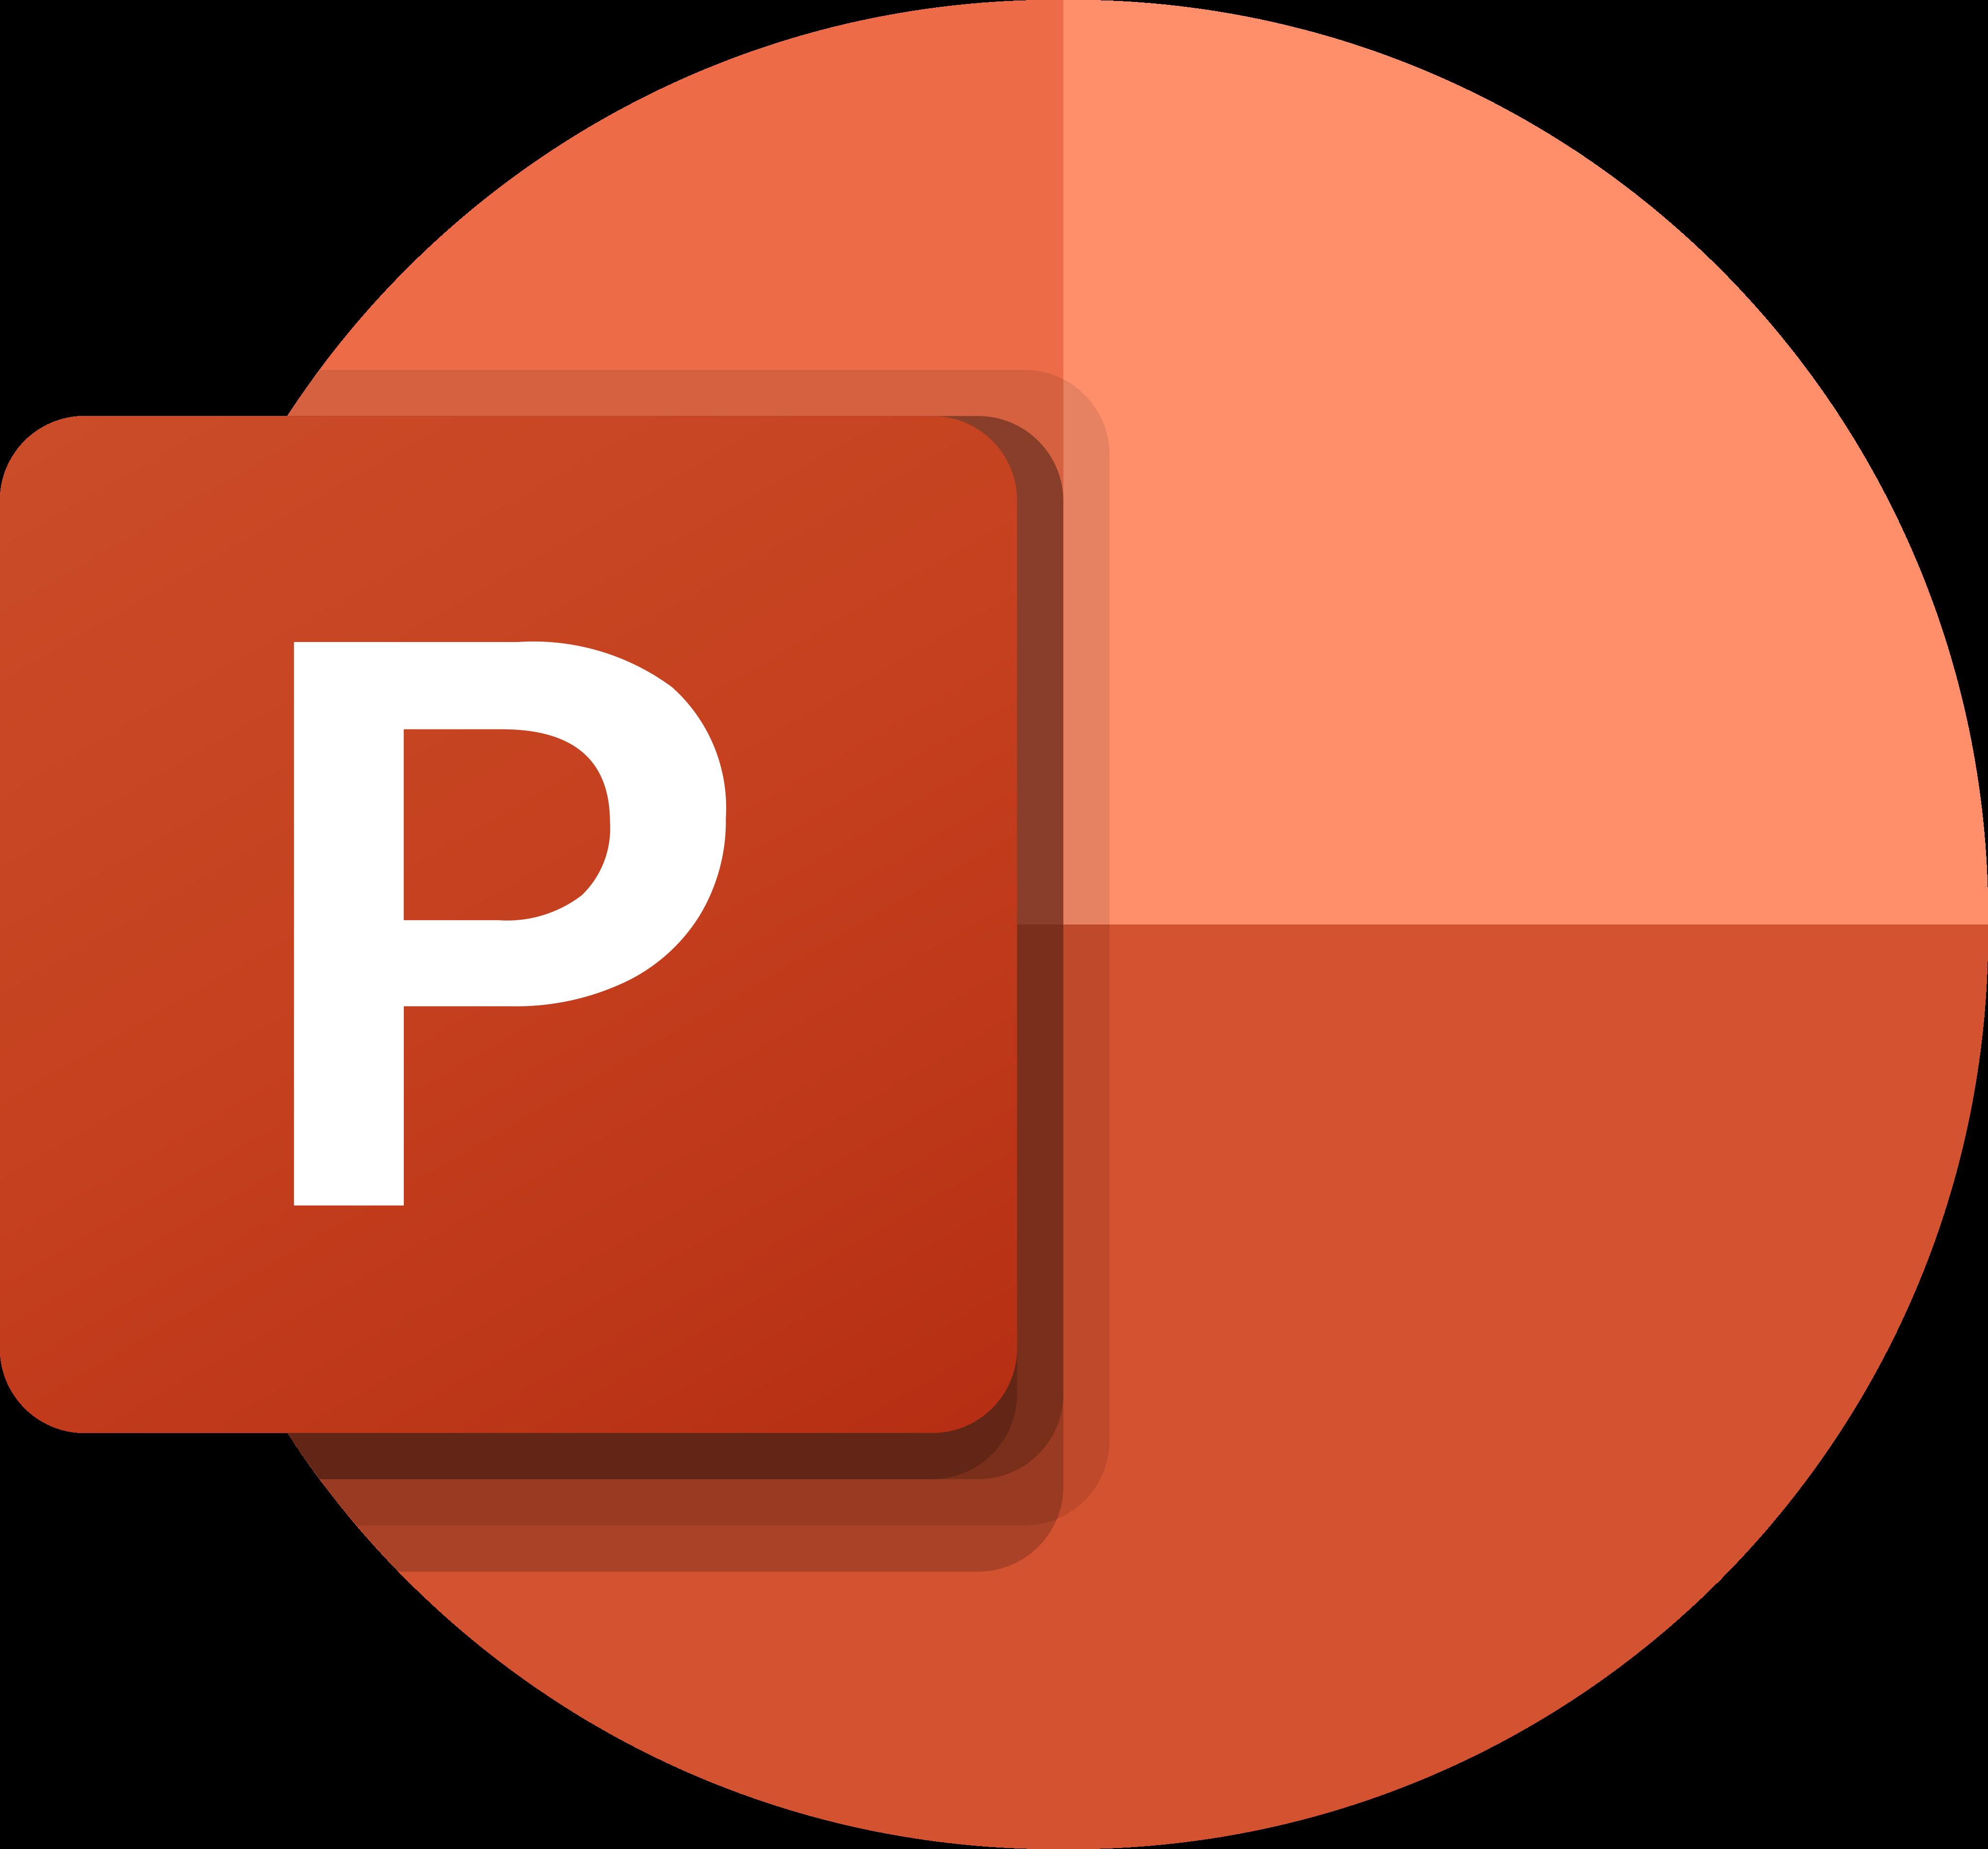 microsoft powerpoint logo - Microsoft PowerPoint Logo